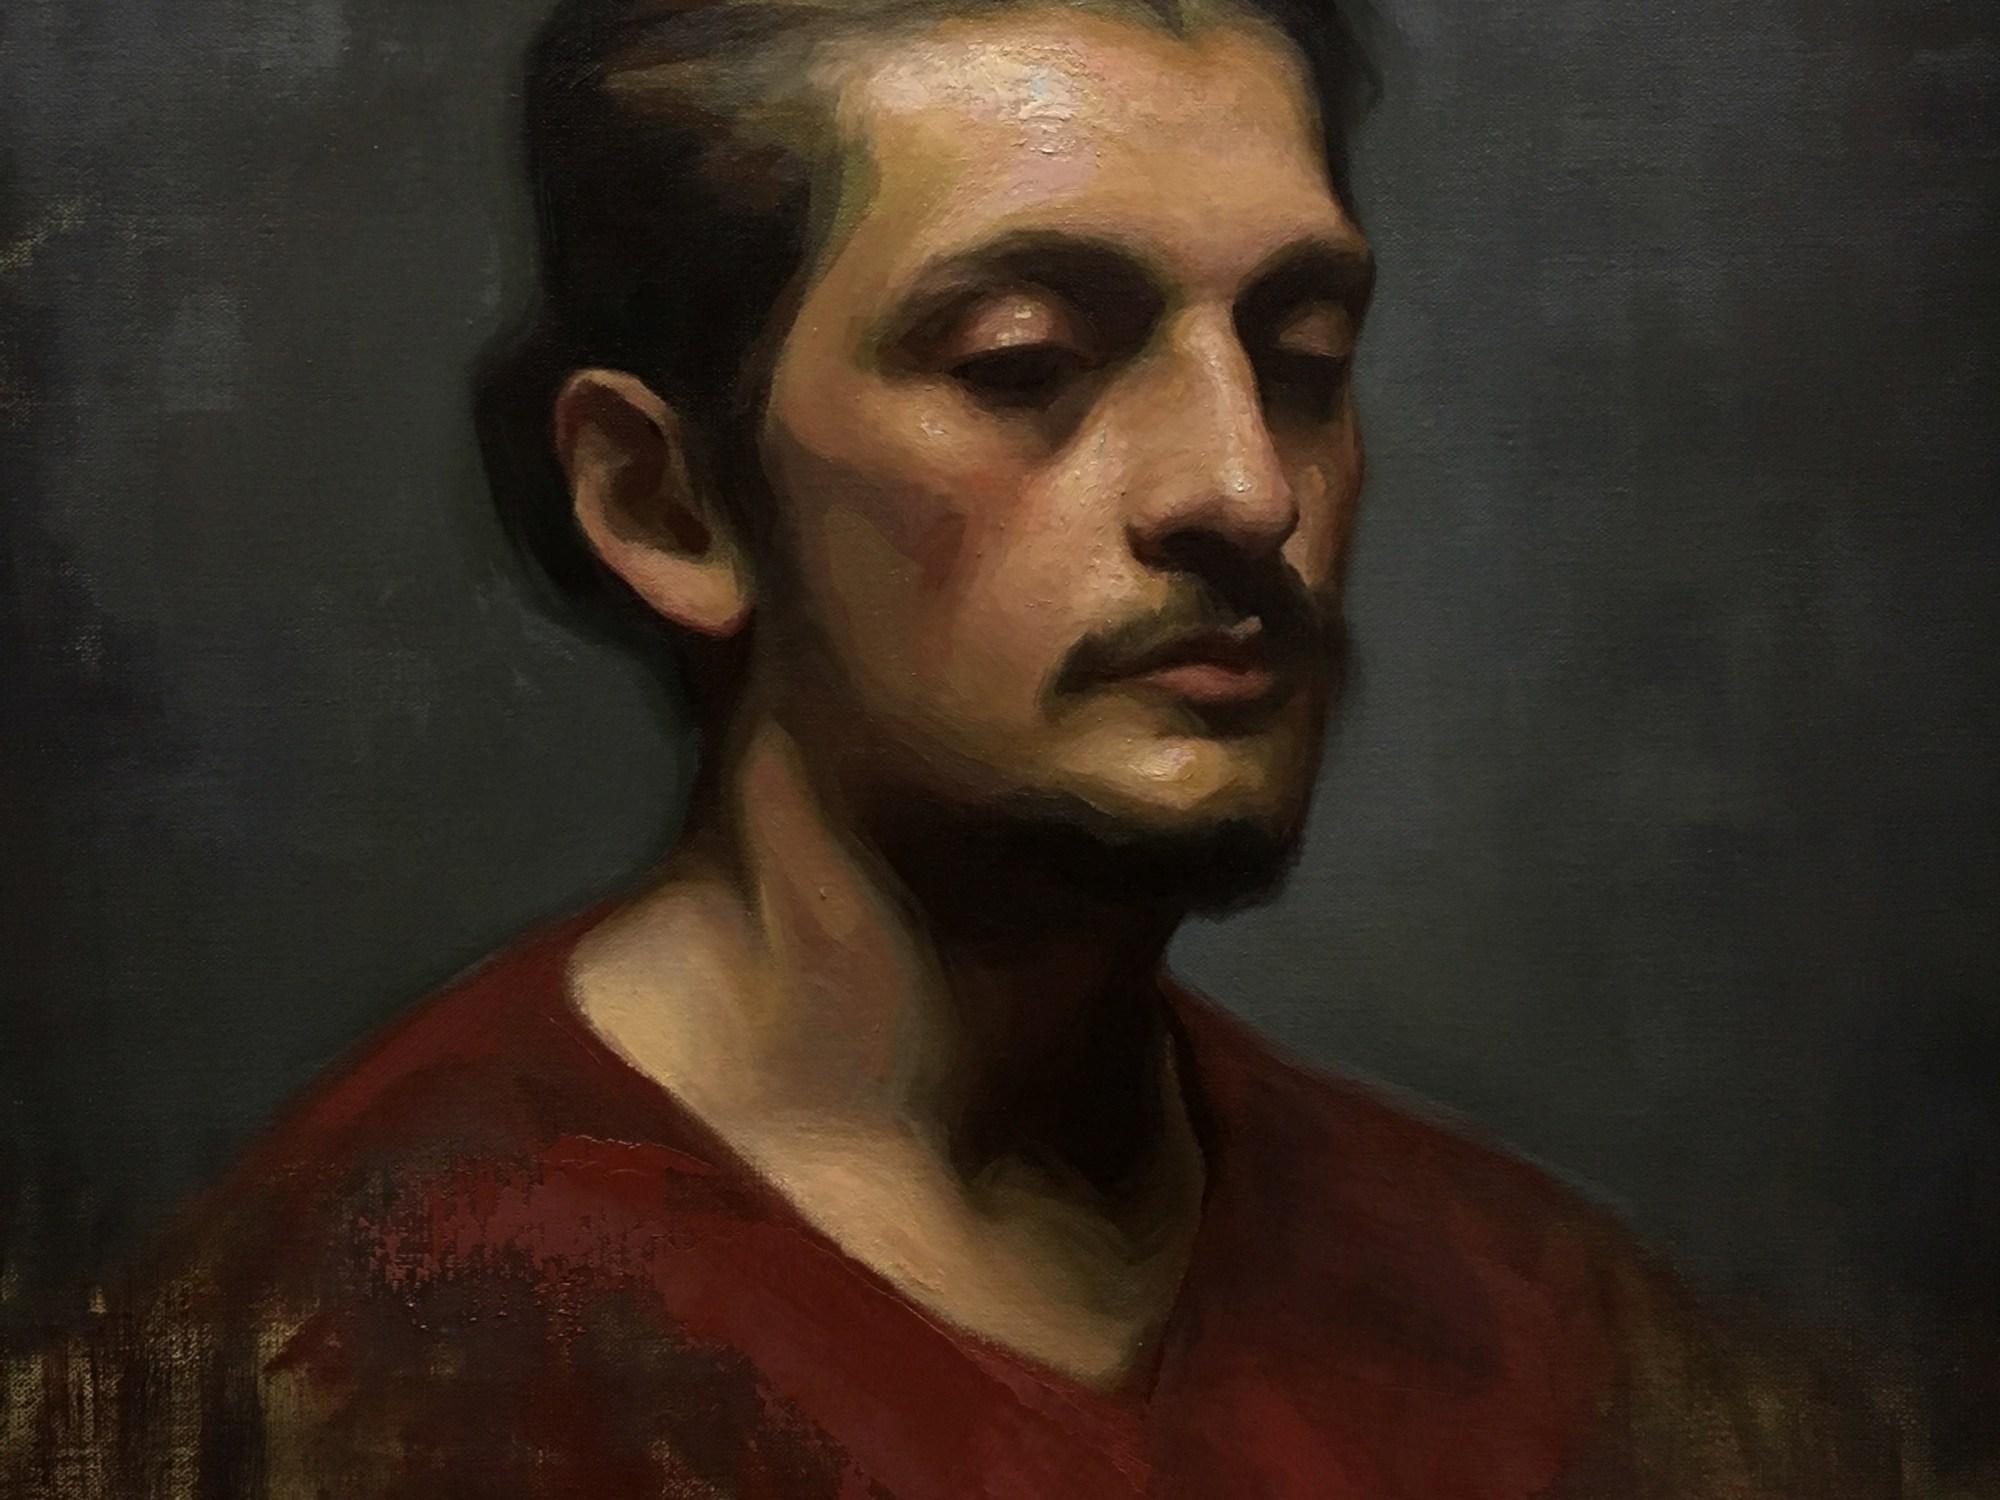 Contemporary-Painting, Spanish-Art, New-Art, Oil-Painters, Academic-Painting, Naturalism, Women-Artists, Portraits